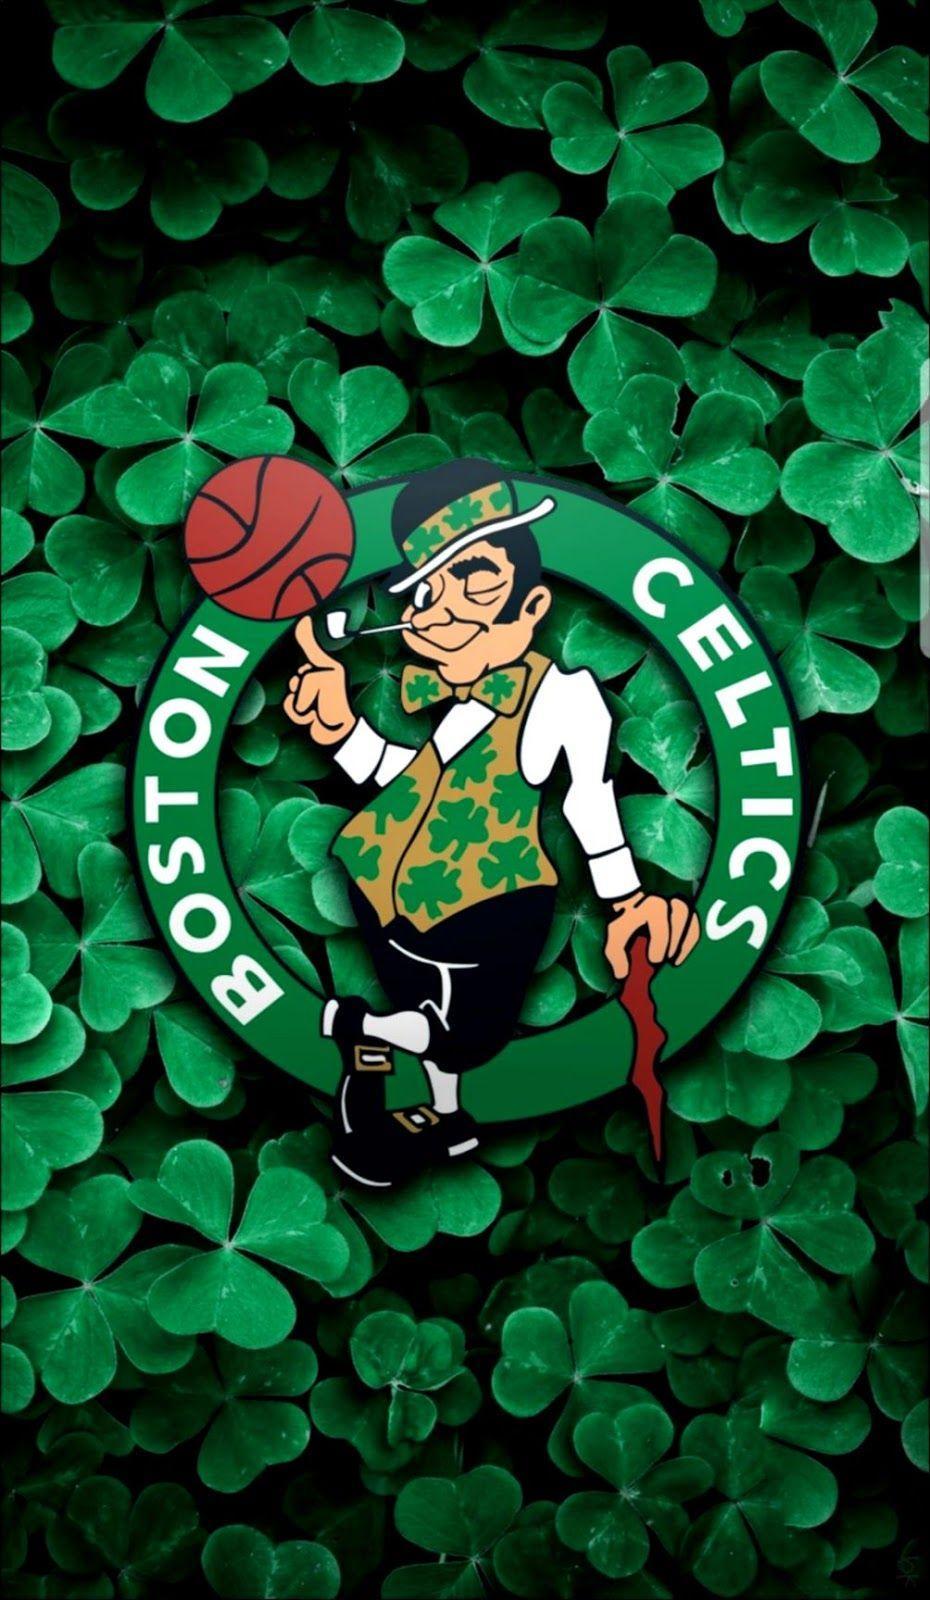 Celtics Iphone Wallpapers Top Free Celtics Iphone